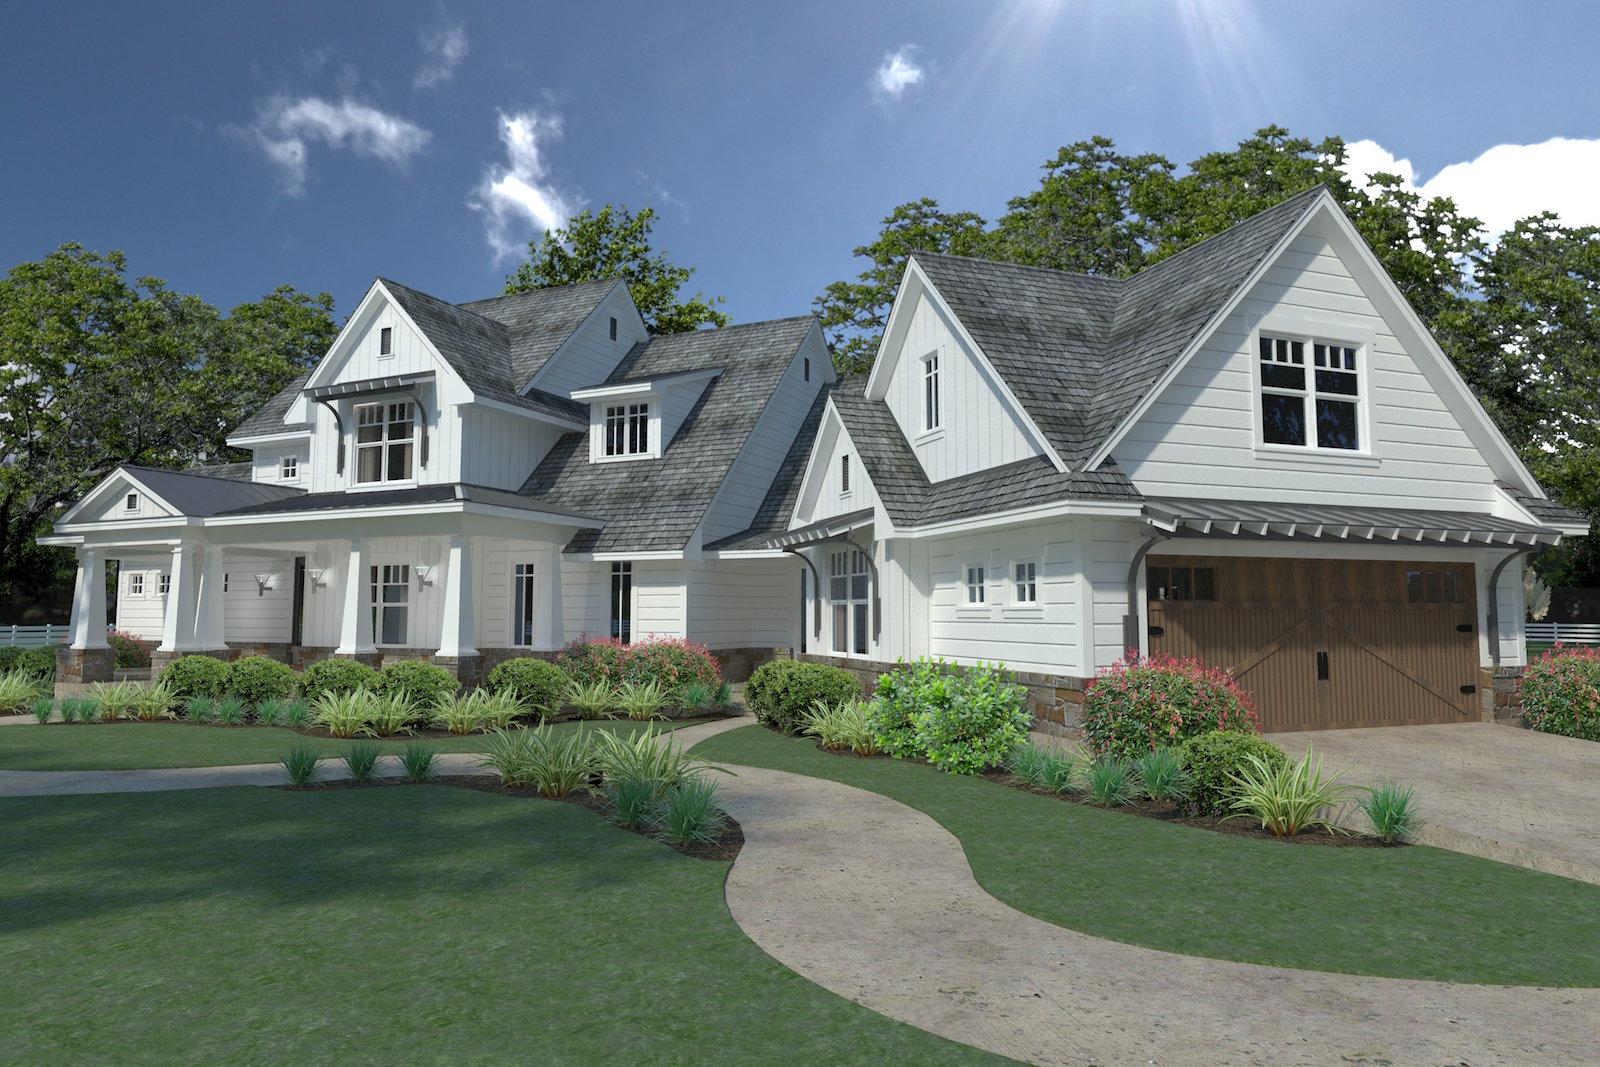 3 Bedrm, 2396 Sq Ft Farmhouse House Plan #117-1124